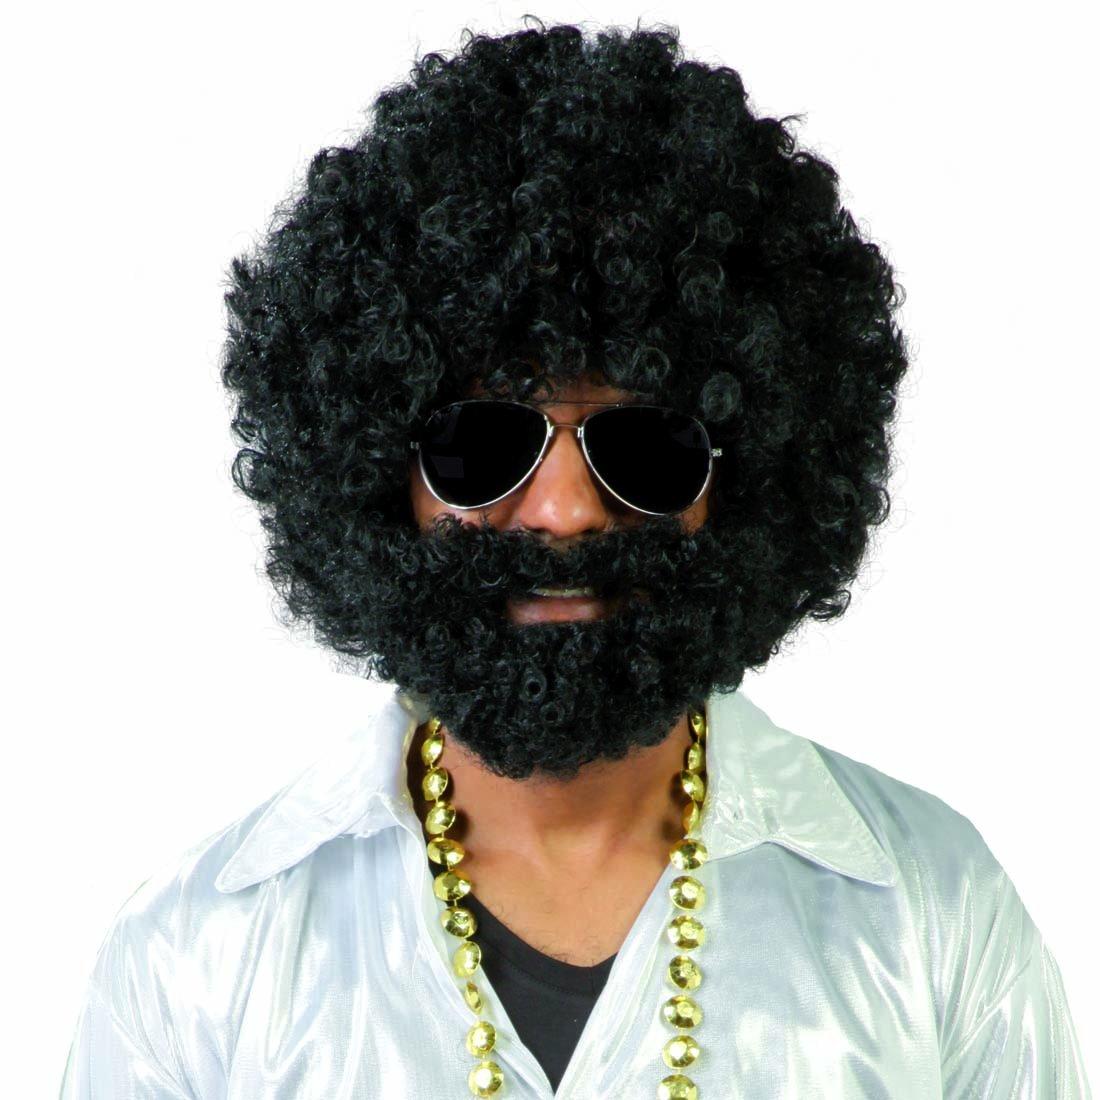 NET TOYS Peluca Afro con Barba Pelo Afro setentero Negro ...